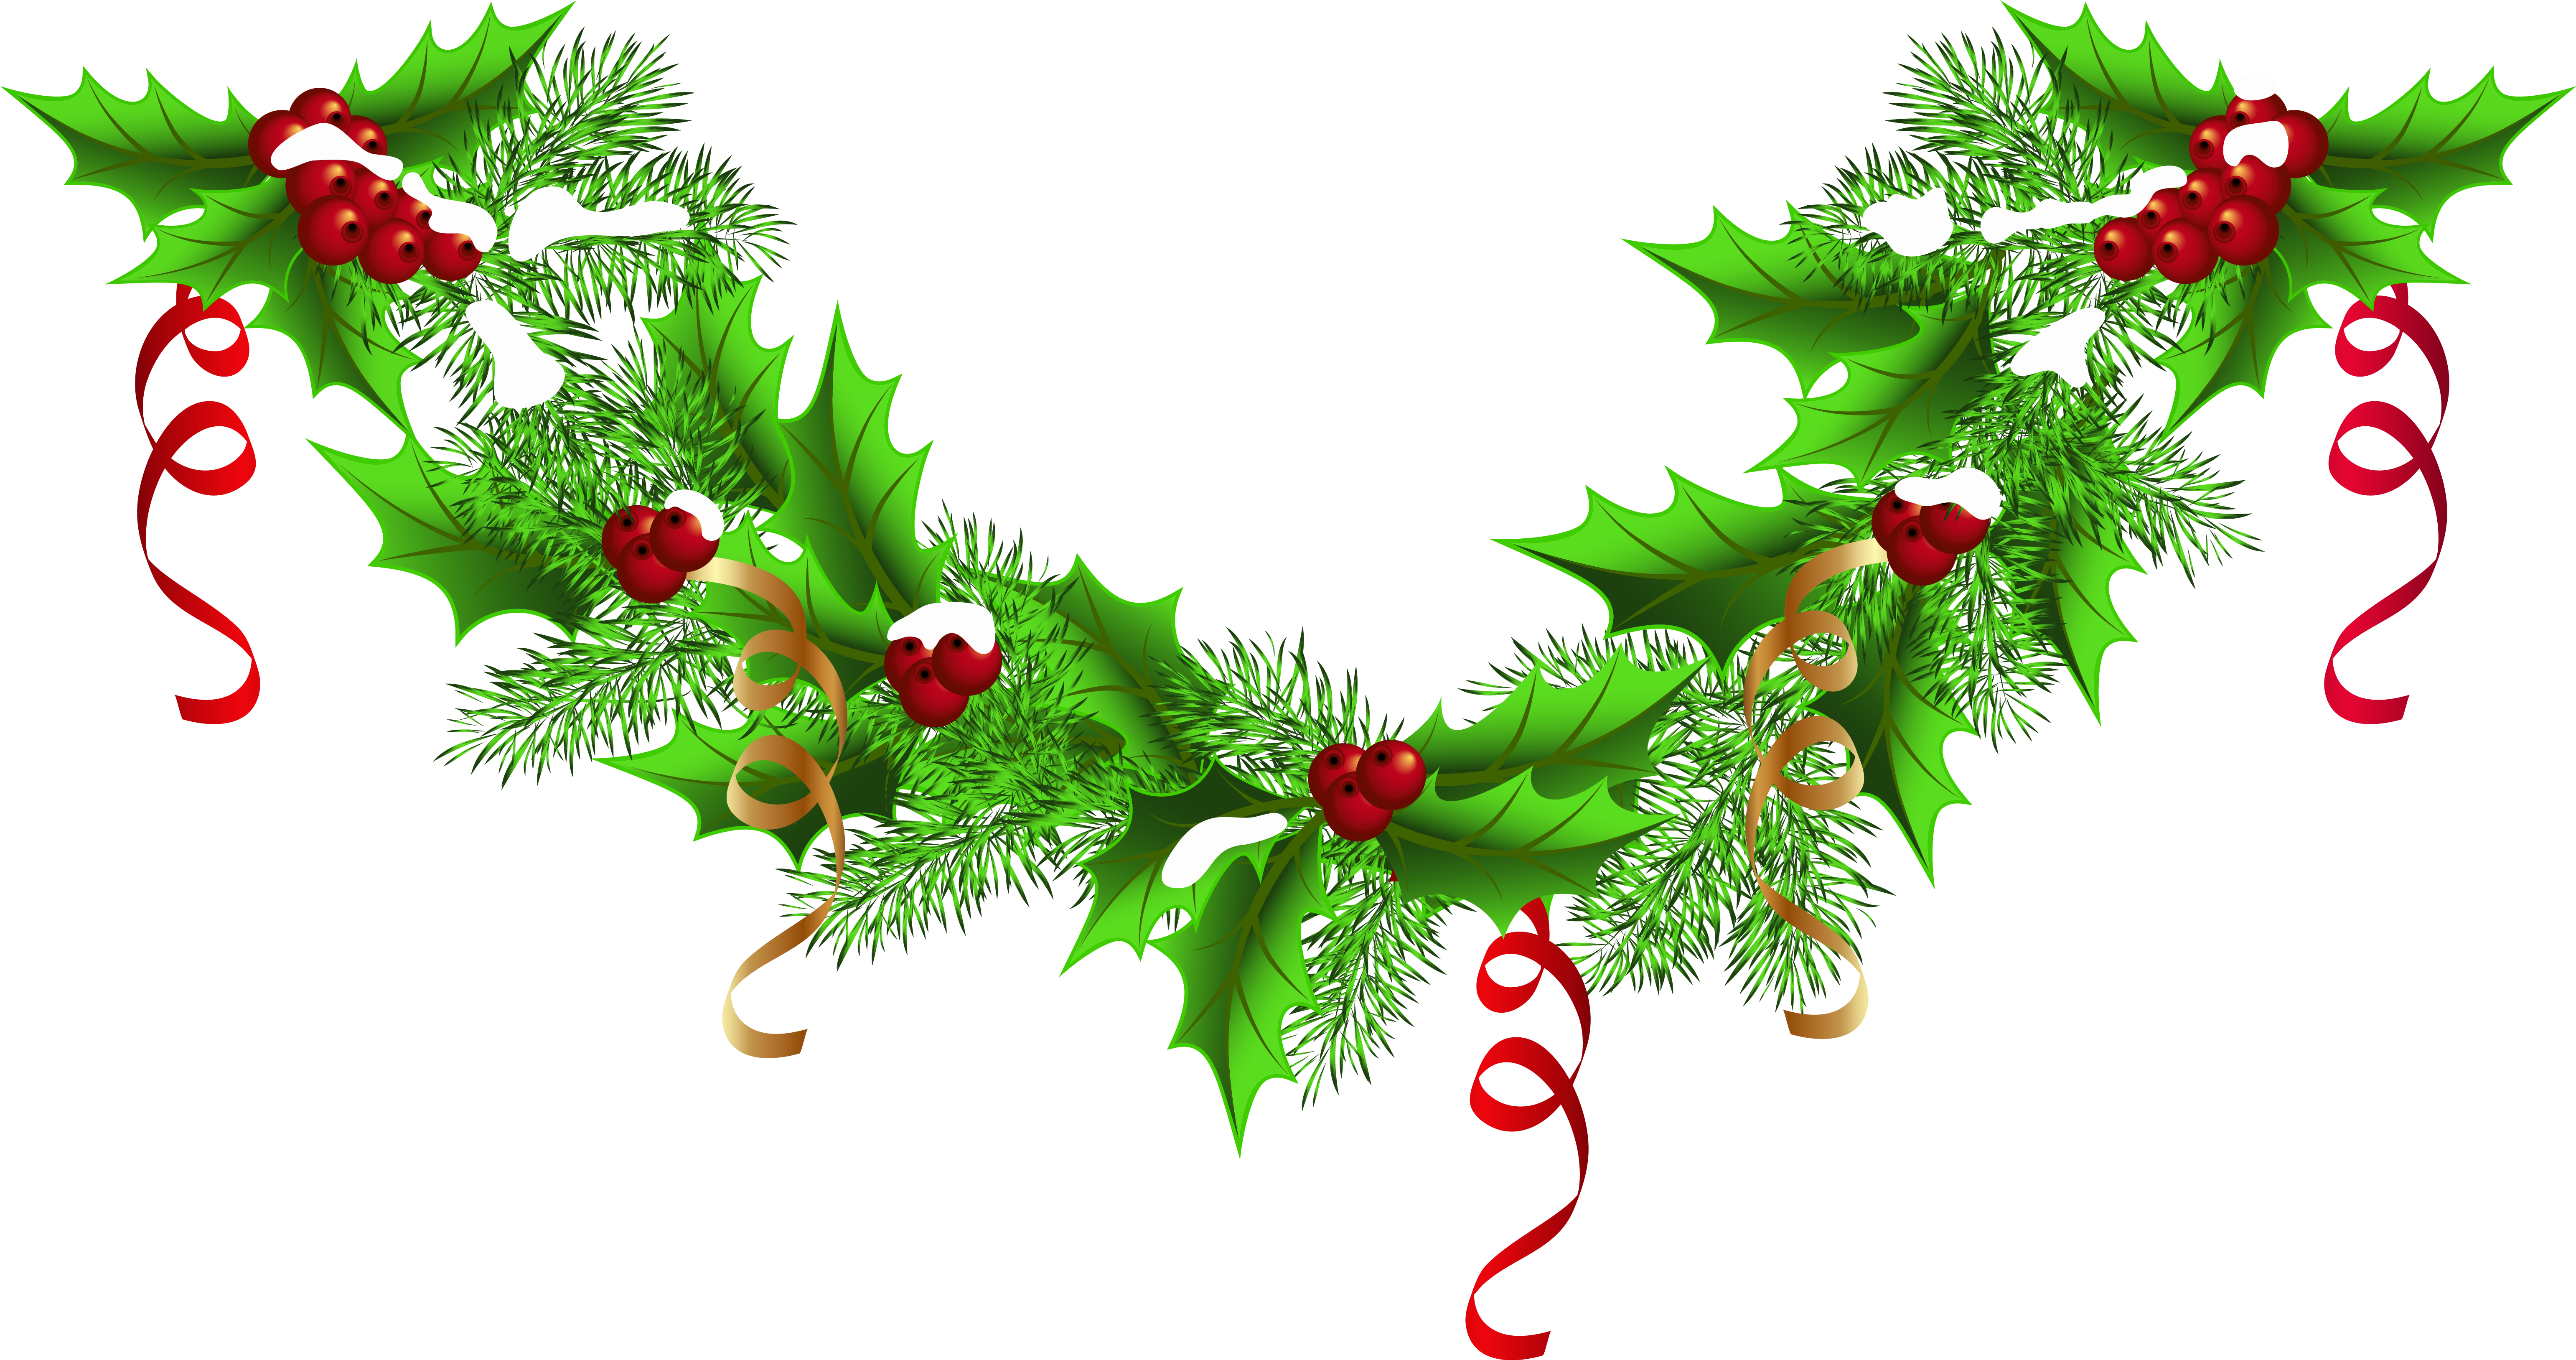 Free christmas wreath border clipart clip library library HD Christmas Garland Border Transparent & Png Clipart - Christmas ... clip library library